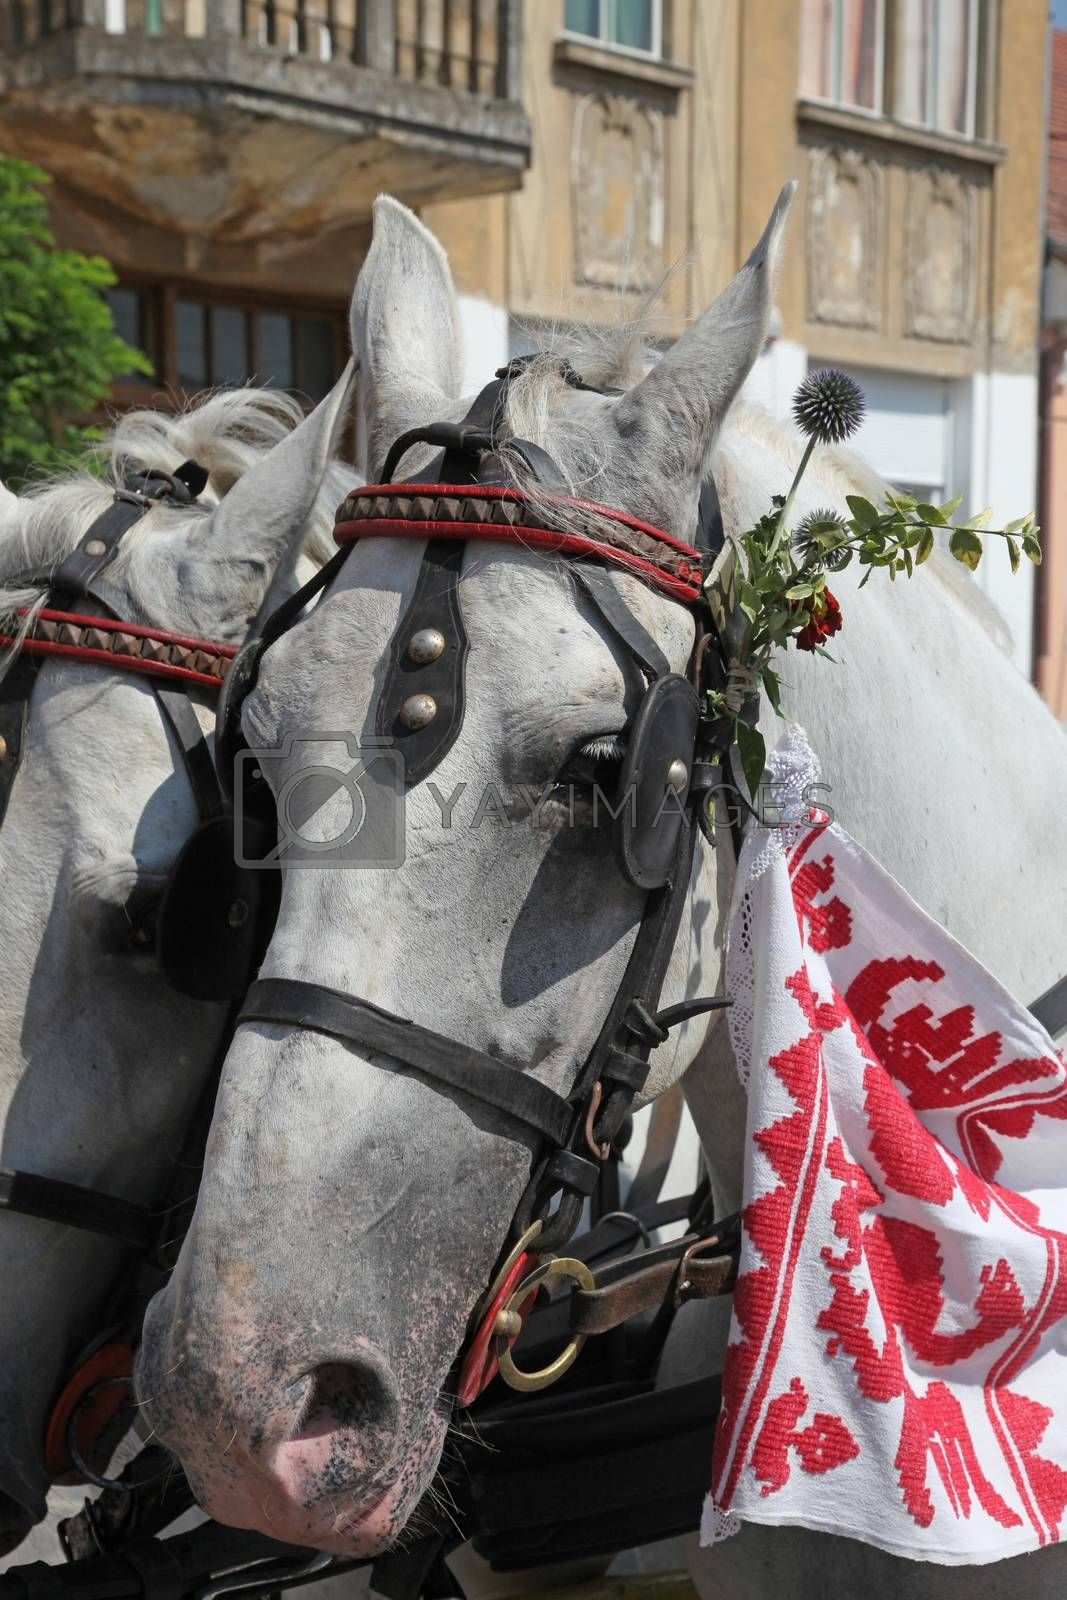 Horse and wedding wagon show during Dakovo vezovi (Dakovo Summer Festival) on July 05, 2009 in Dakovo, Croatia.